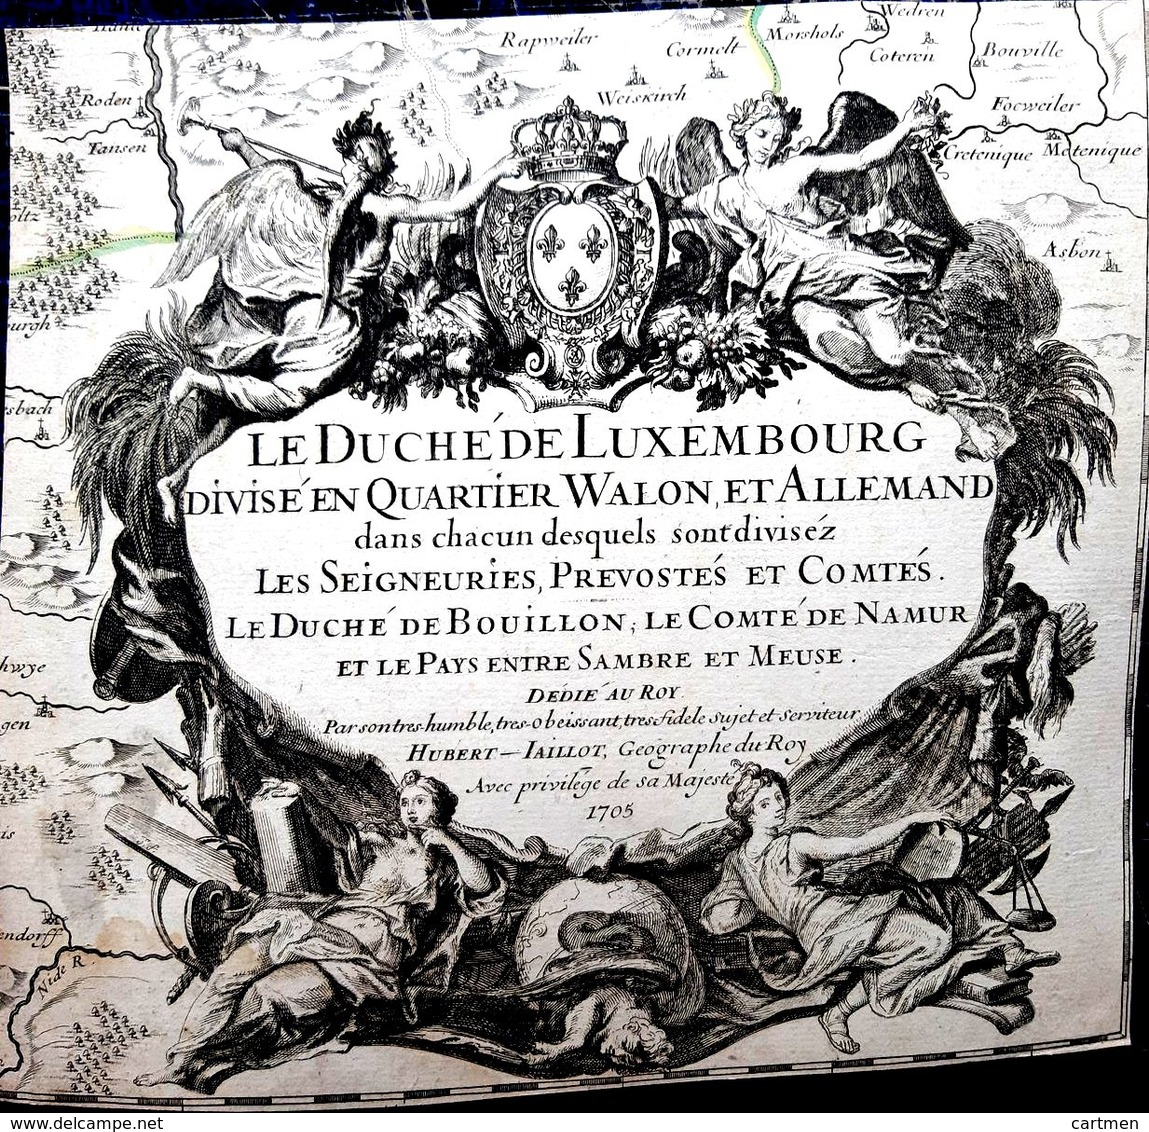 LUXEMBOURG ATLAS  MAP CARTE GEOGRAPHIQUE ANCIENNE PAGE DE TITRE DECOUPEE FRONTISPICE GRAVE 18° - Geographical Maps